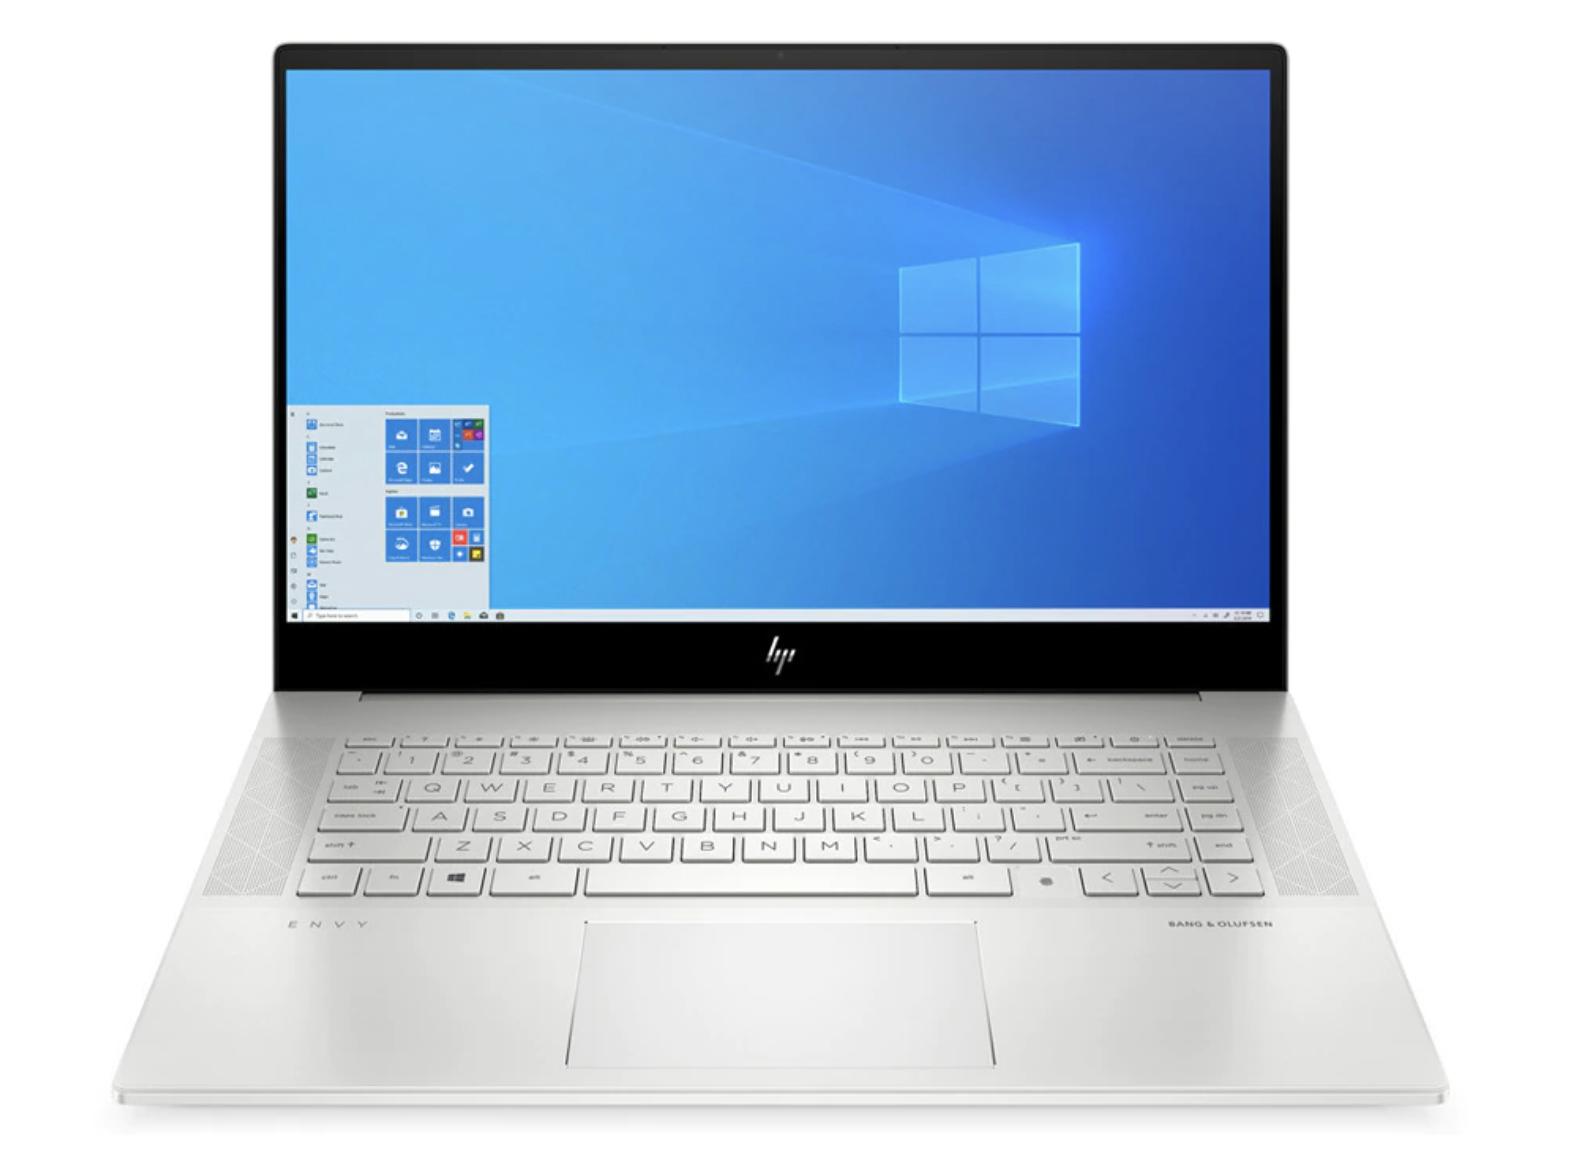 HP ENVY 15-ep0008ns, i7, 16GB, 1TB SSD, GeForce RTX 2060 6GB